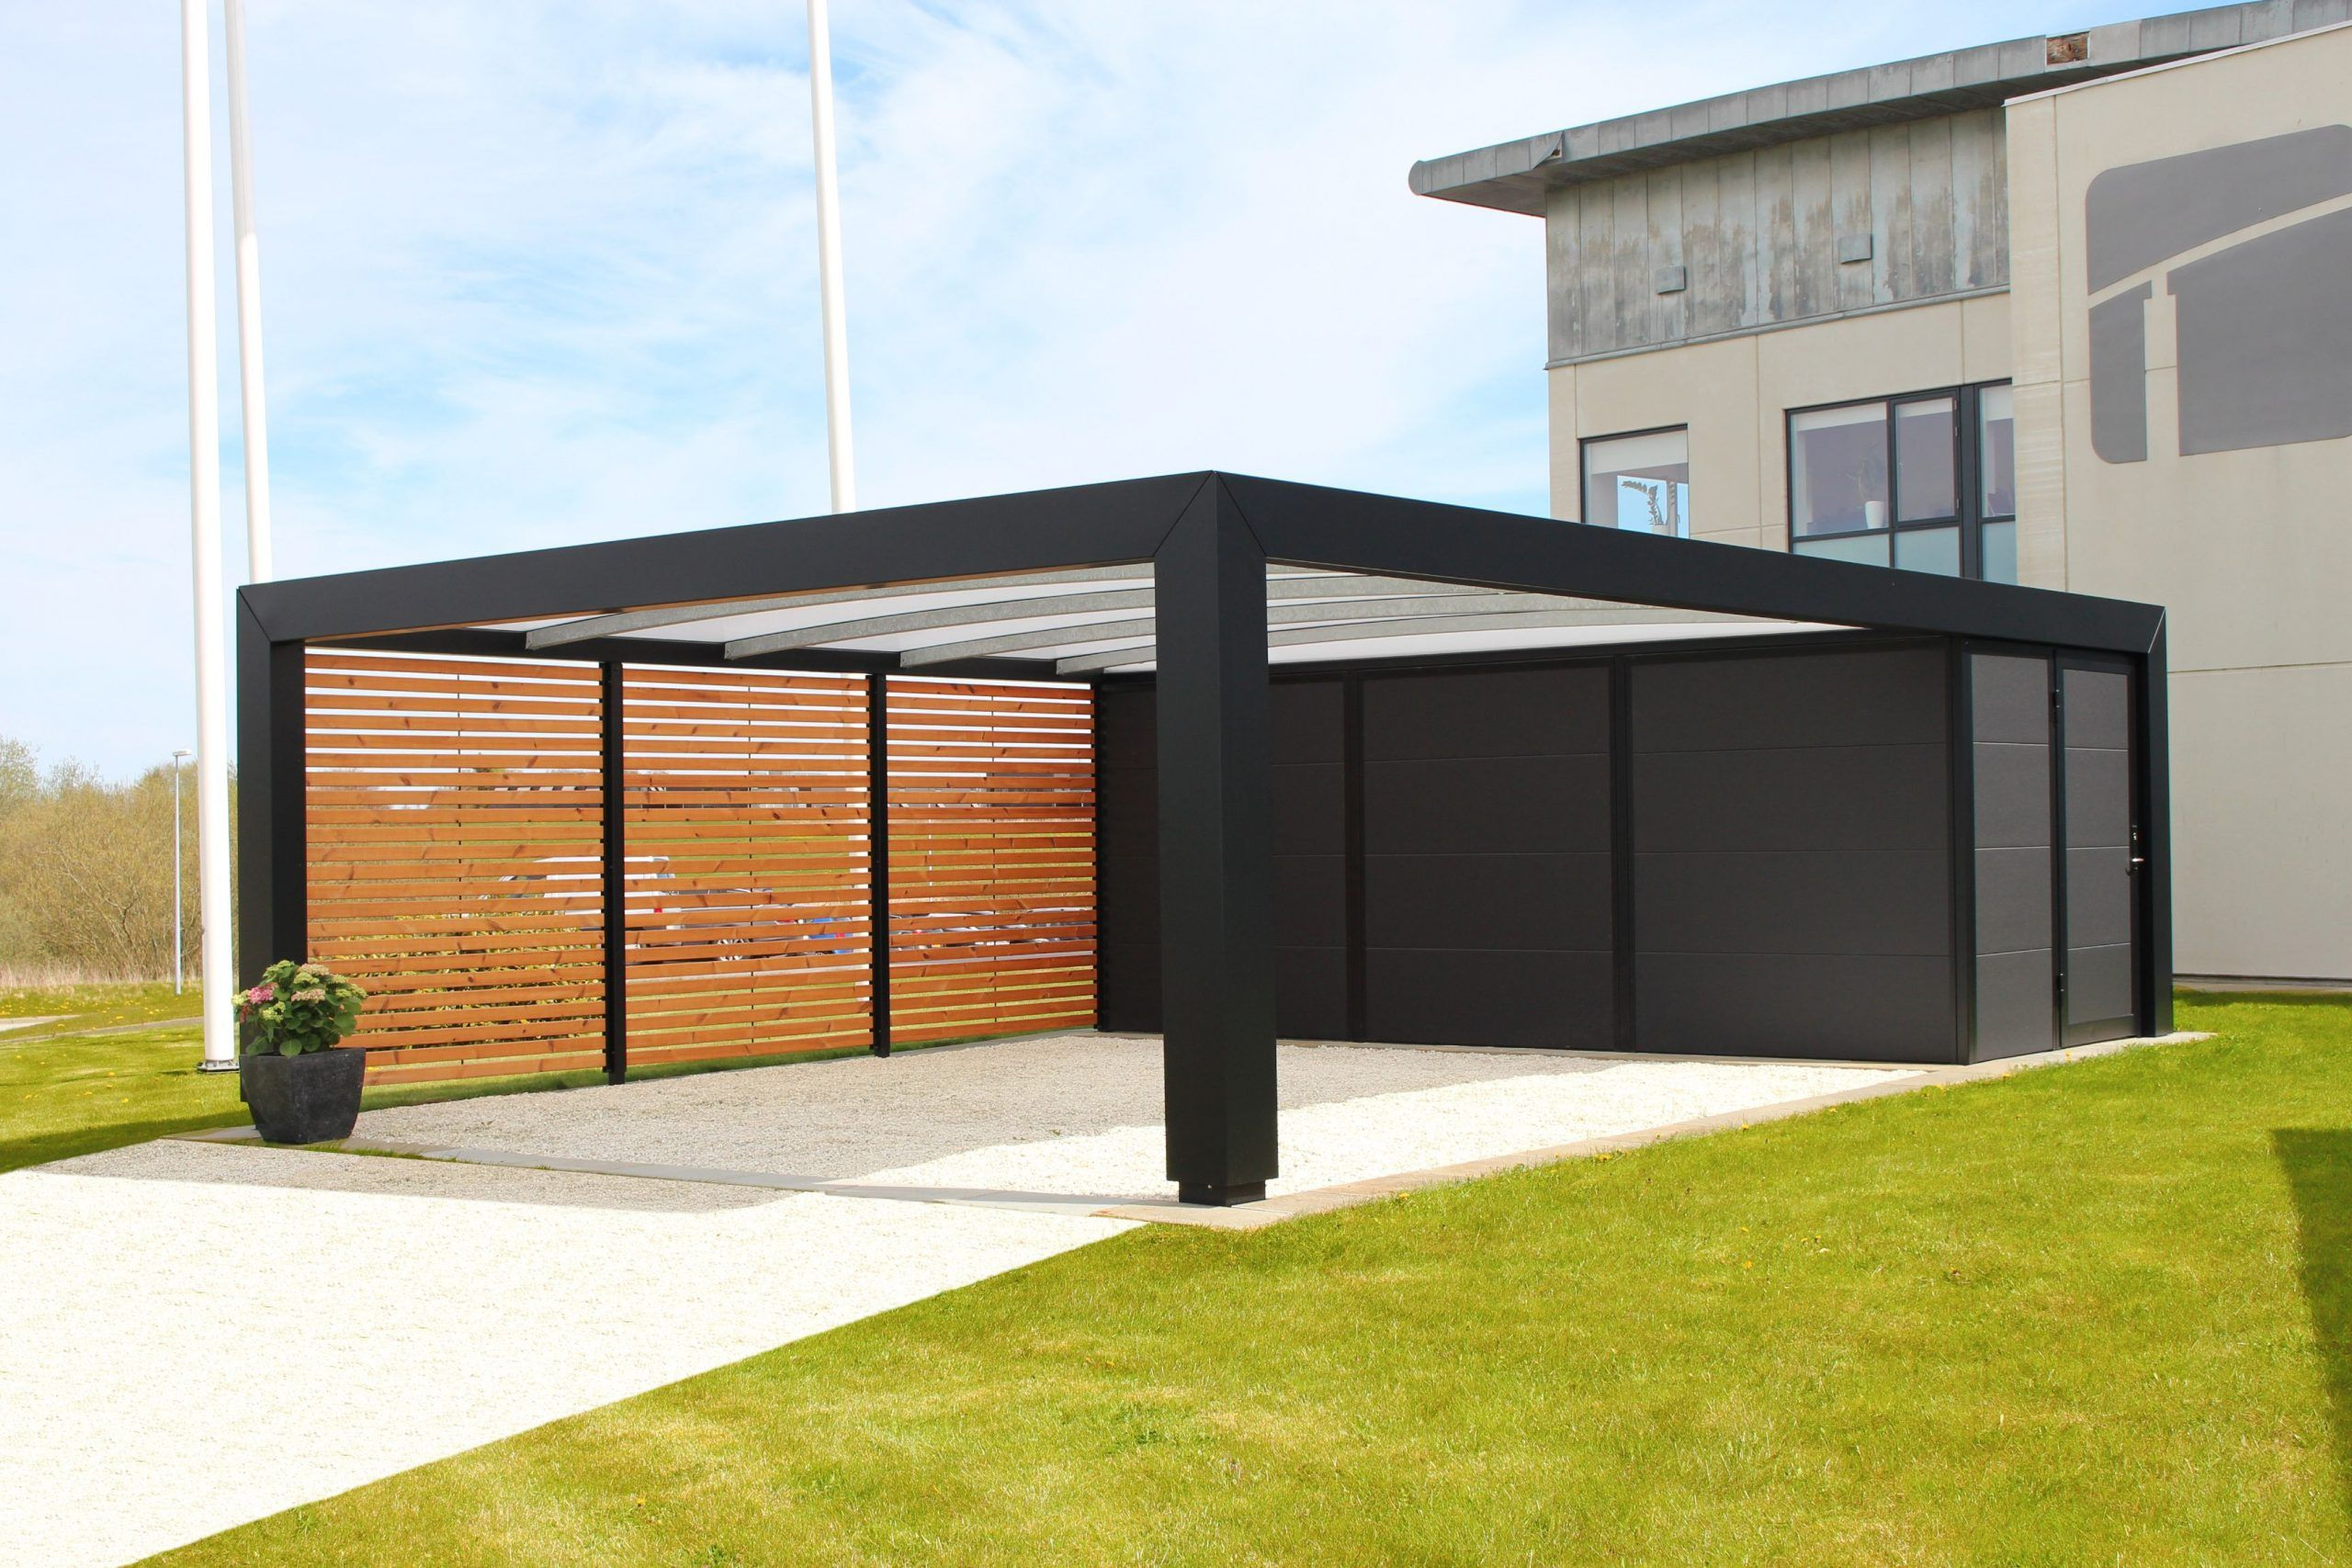 Kubic Carport Carport Kubic In 2020 Carport Designs Carport Garage Modern Carport